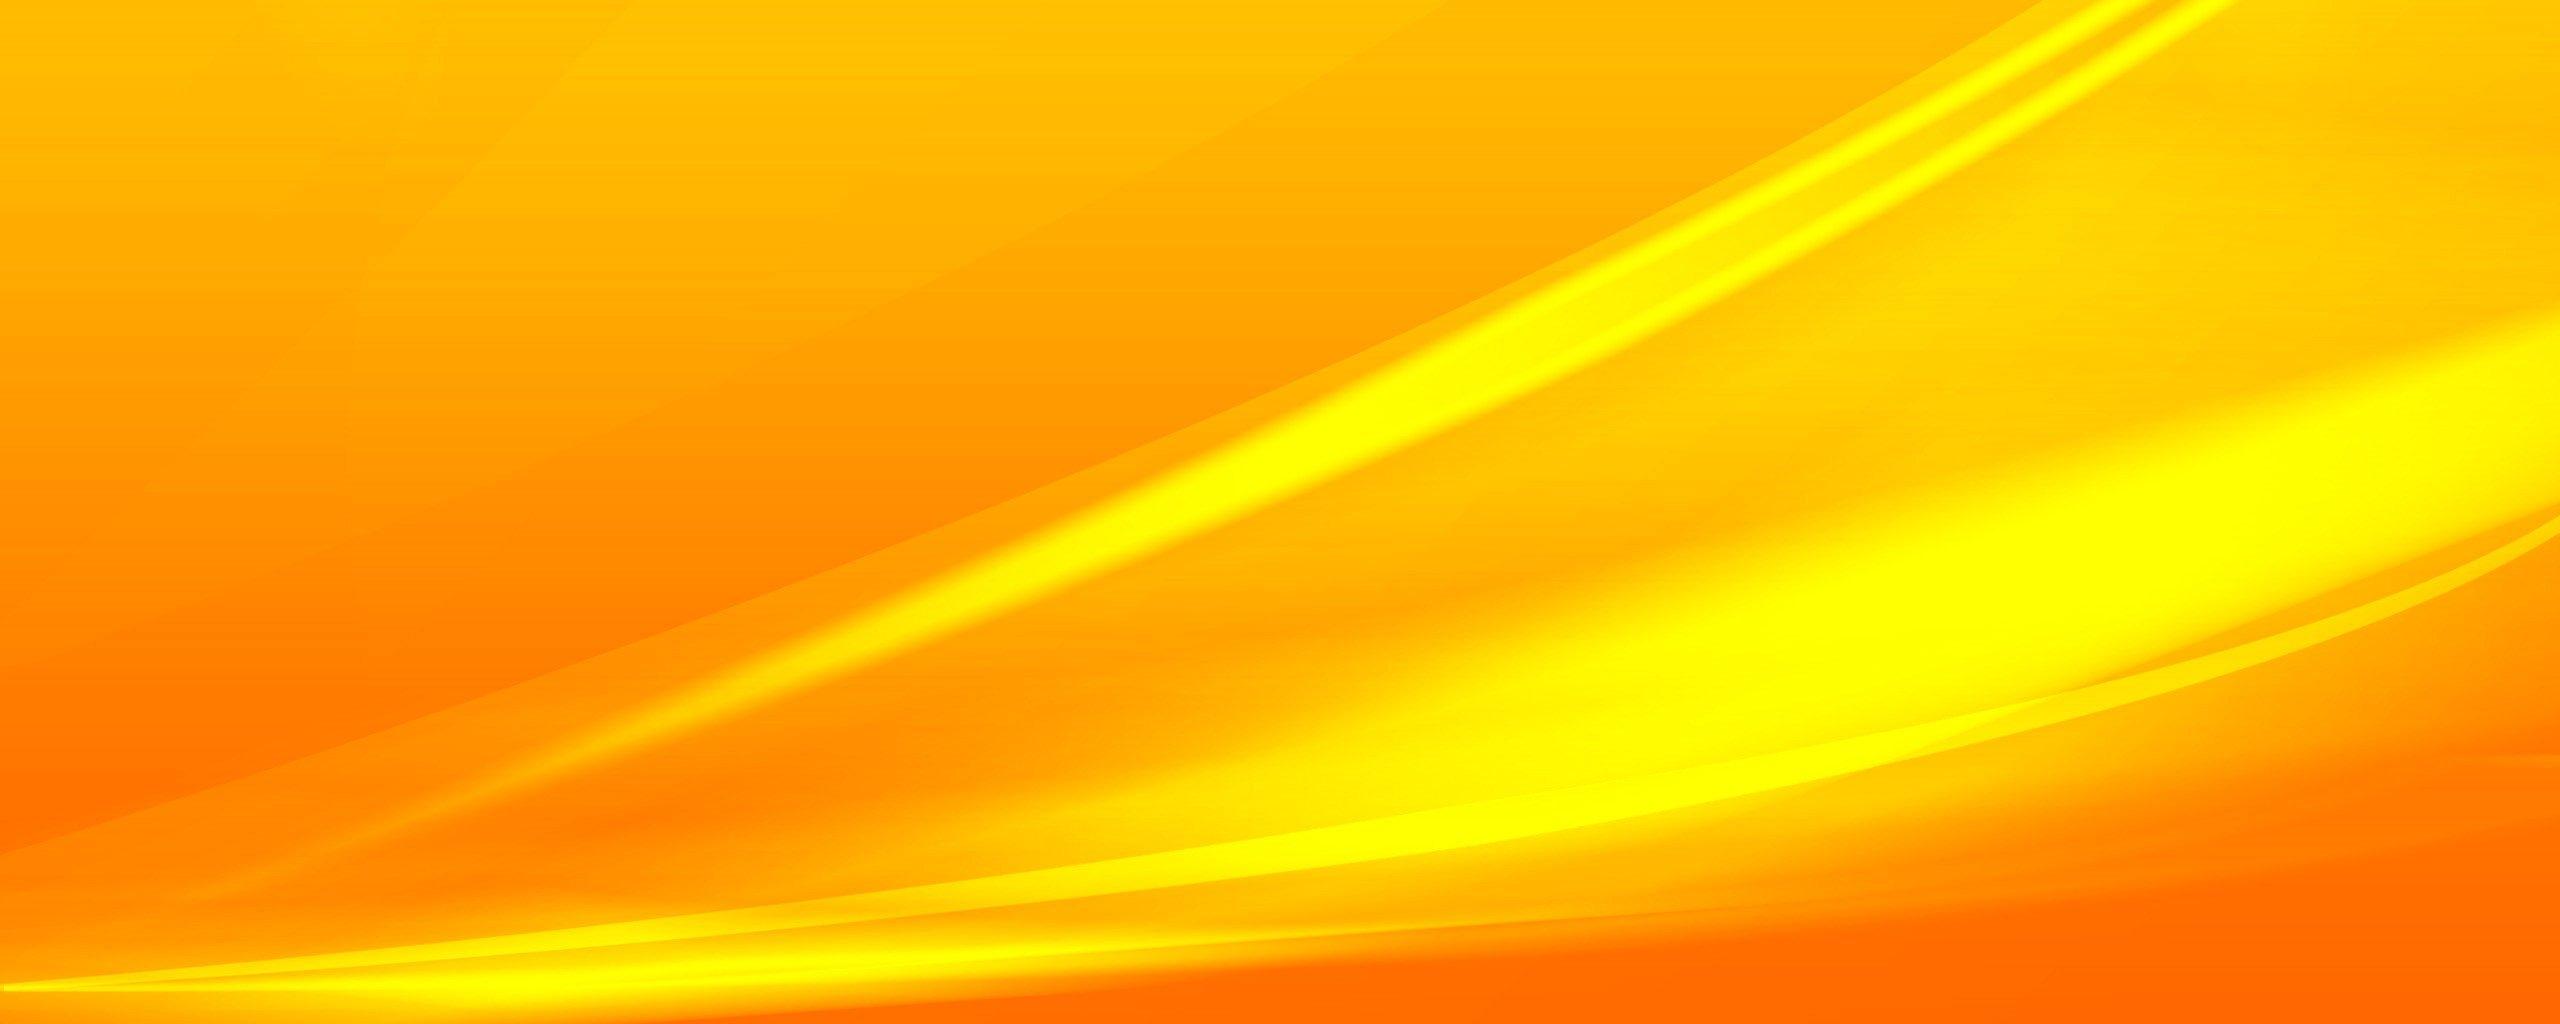 3840x1080 Wallpaper Hd Abstract Dual Screen Wallpaper 2560x1024 313168